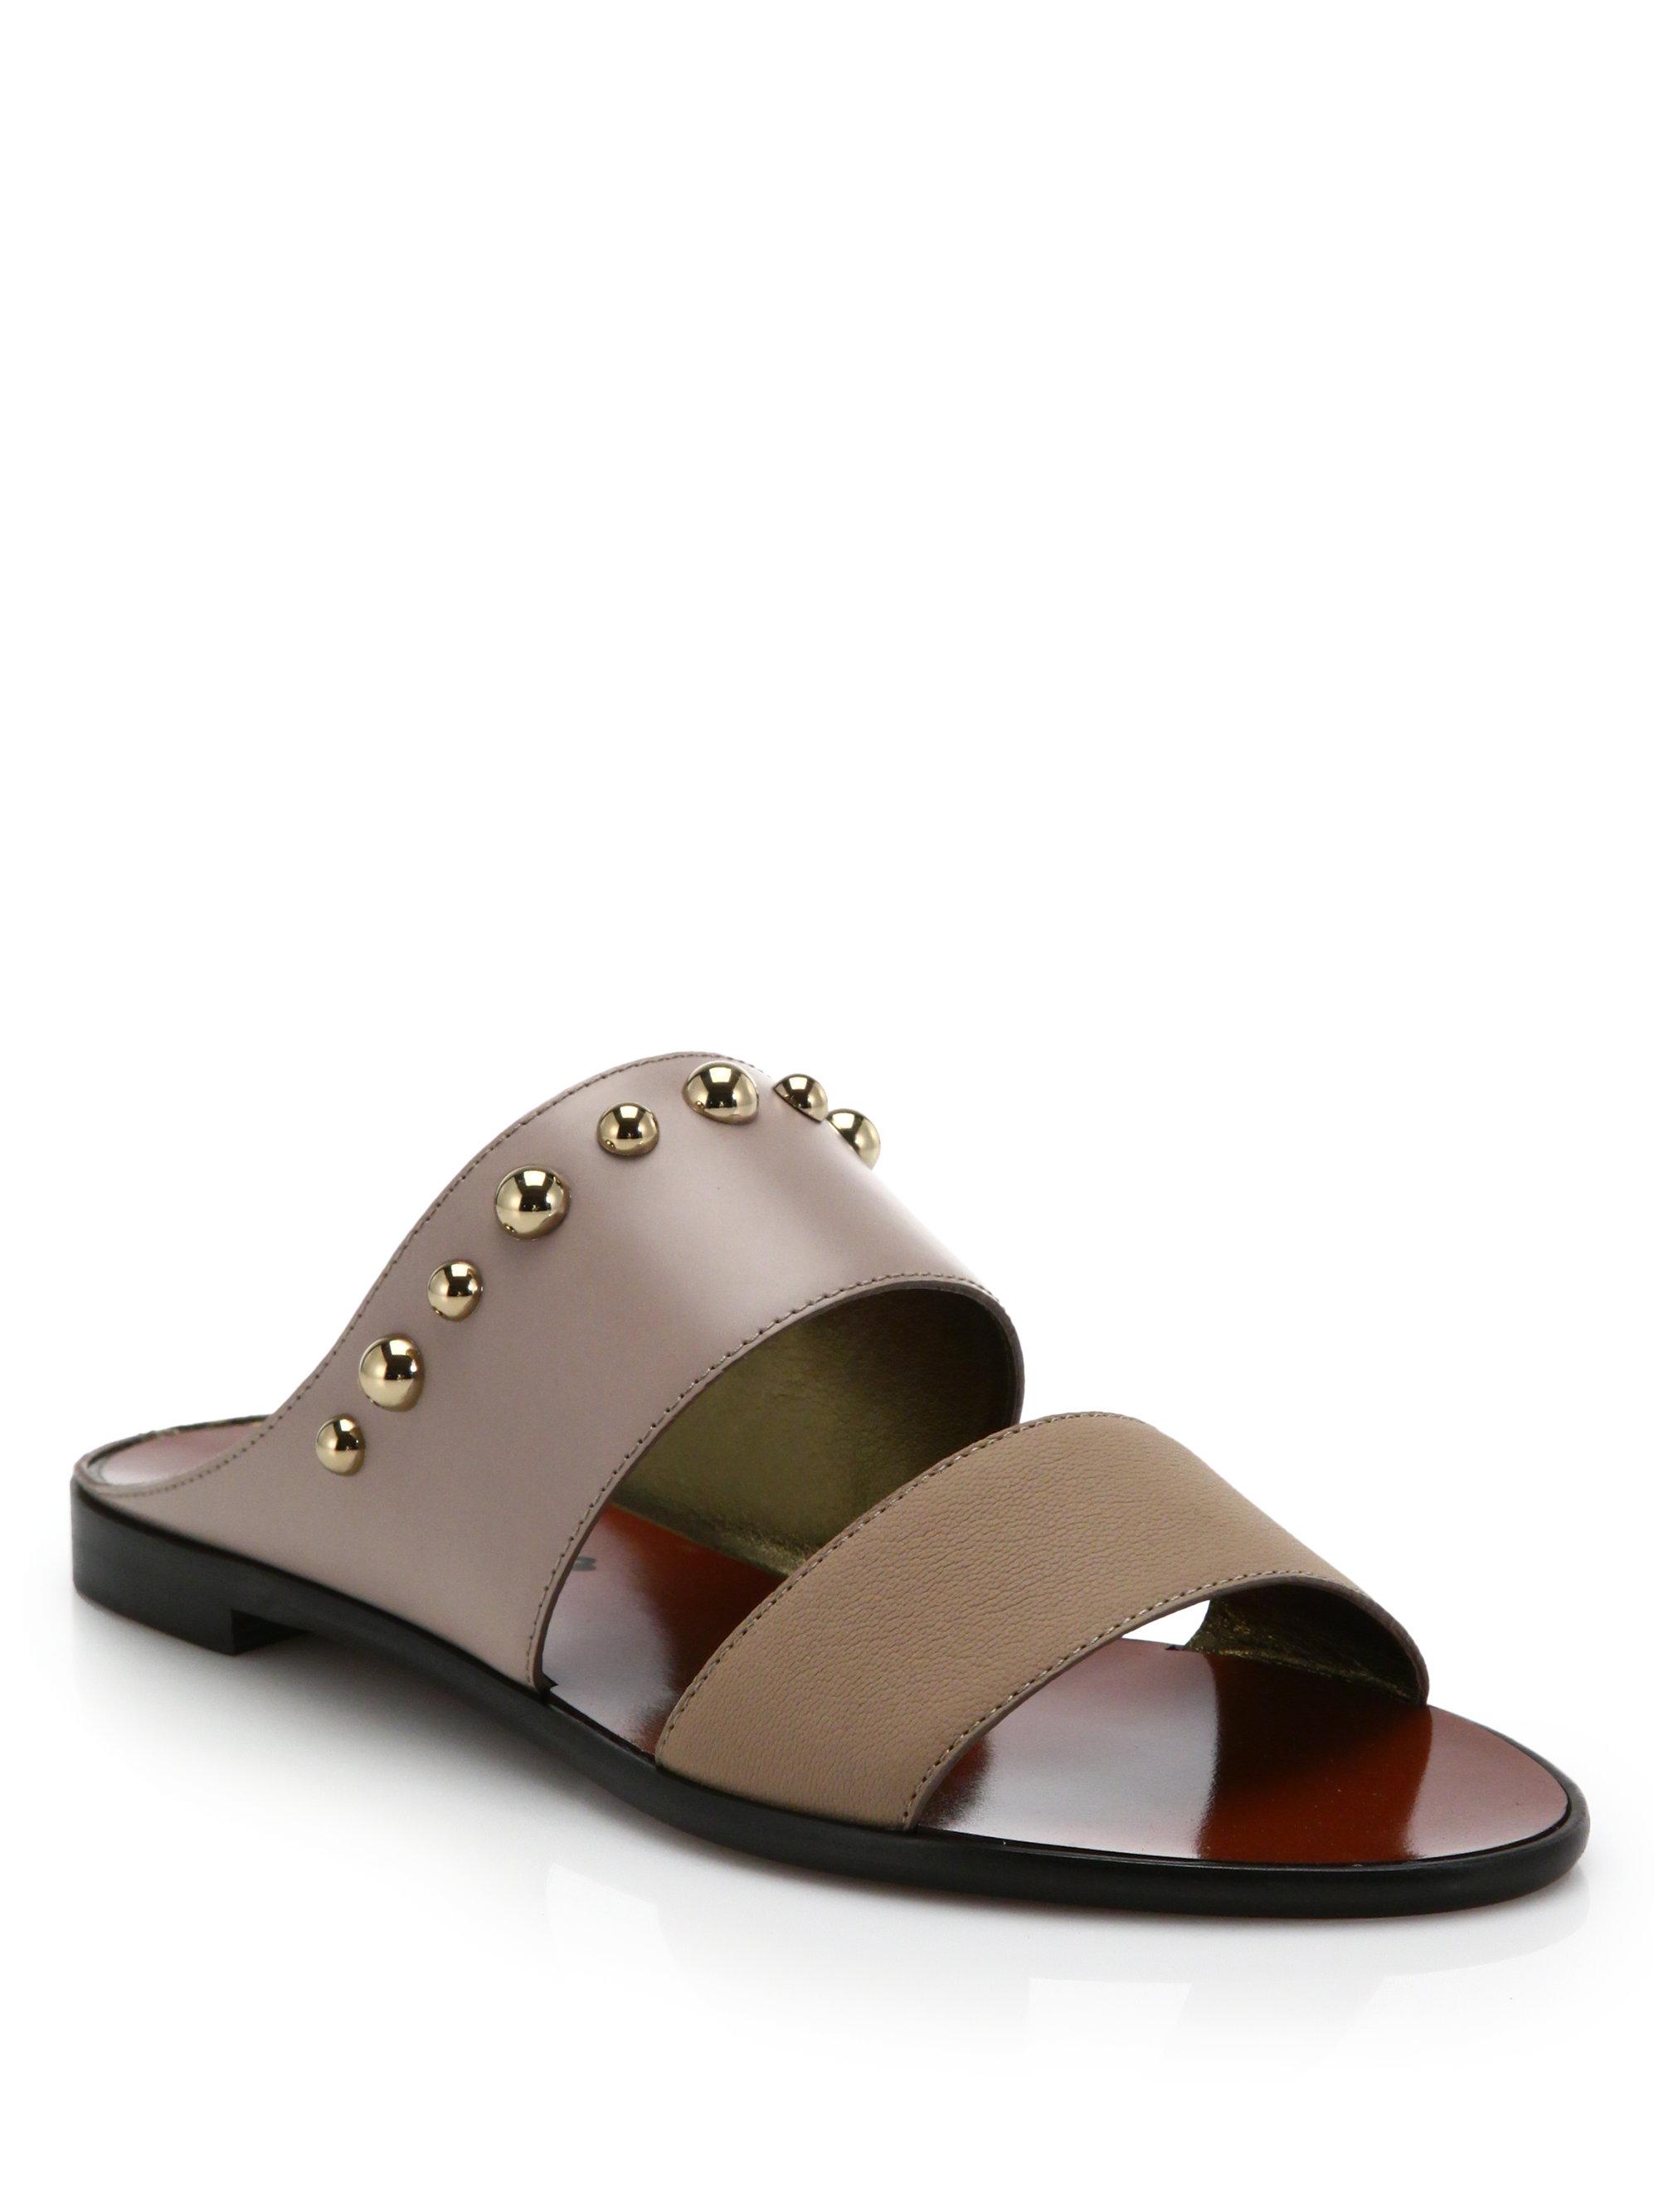 Lanvin Slide sandals EkBniWU